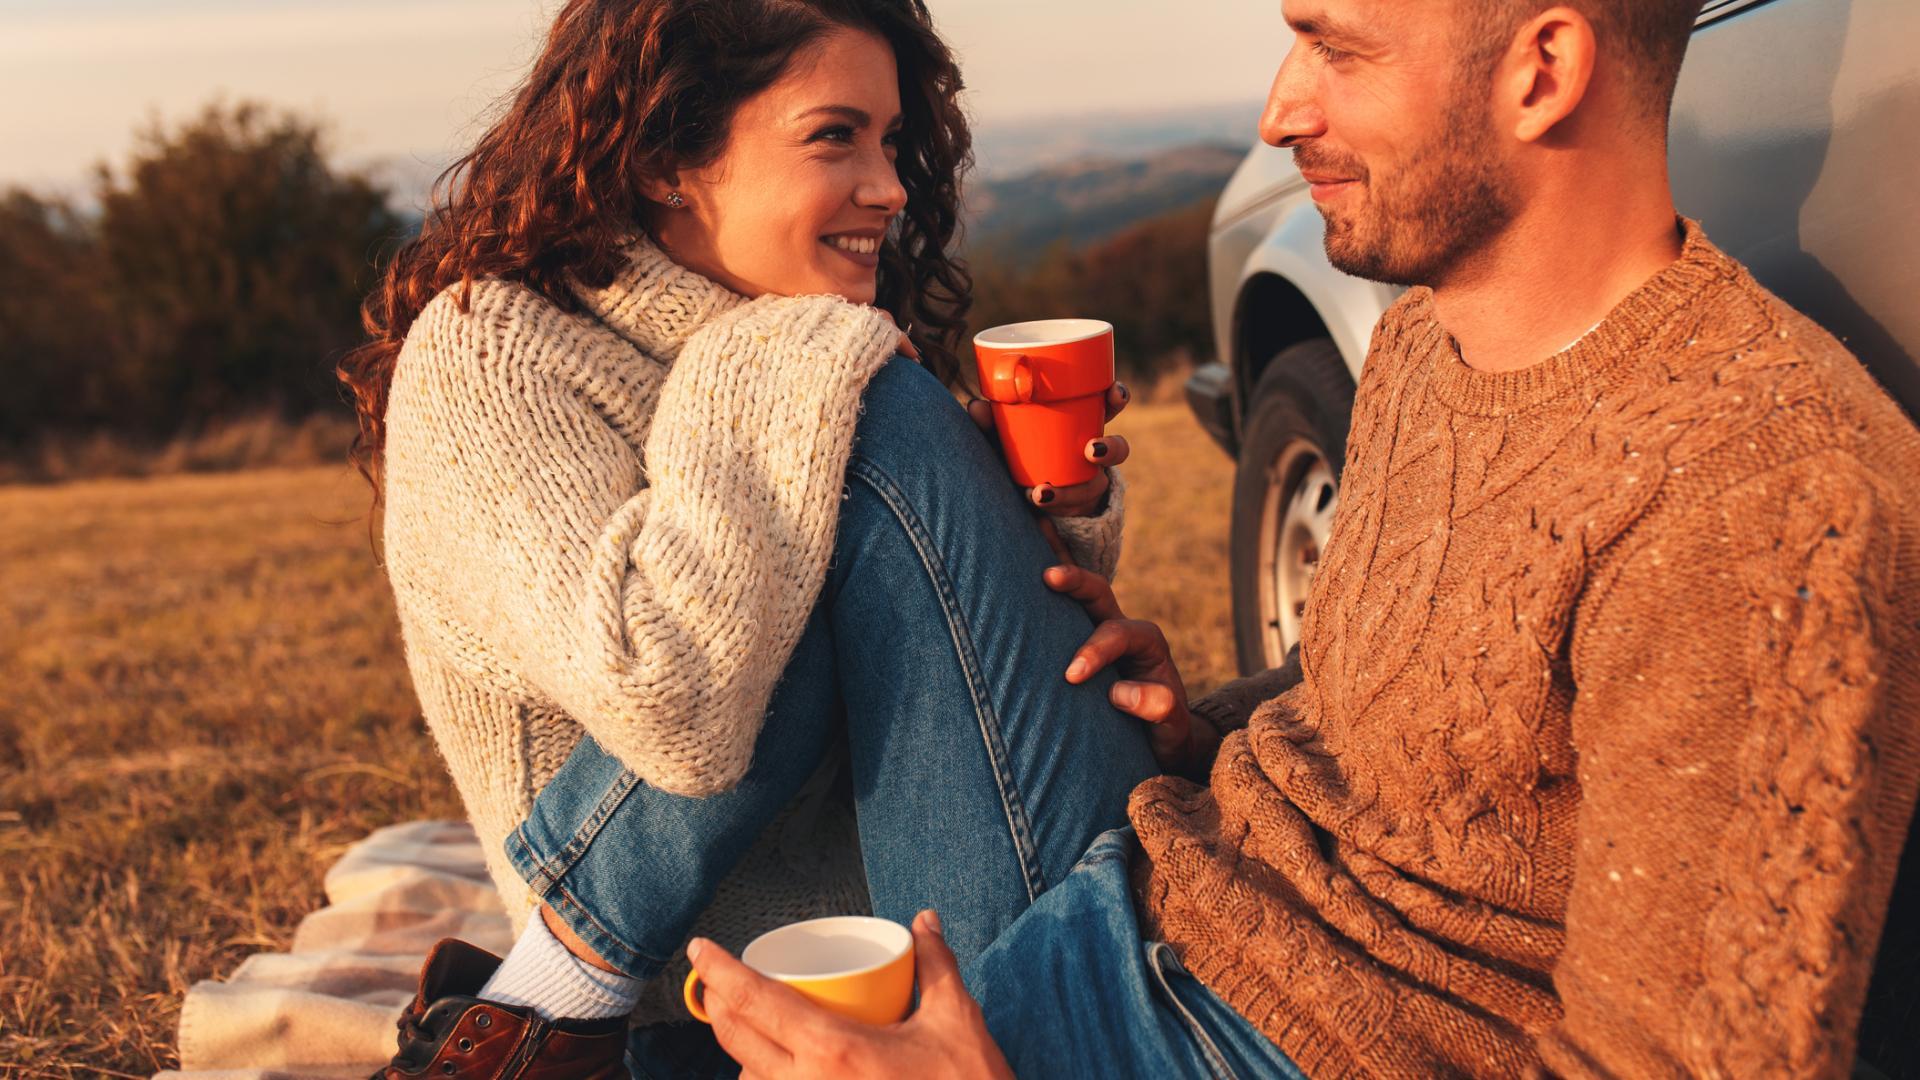 Paar im Park picknick frau mann fraußen ausflug auto